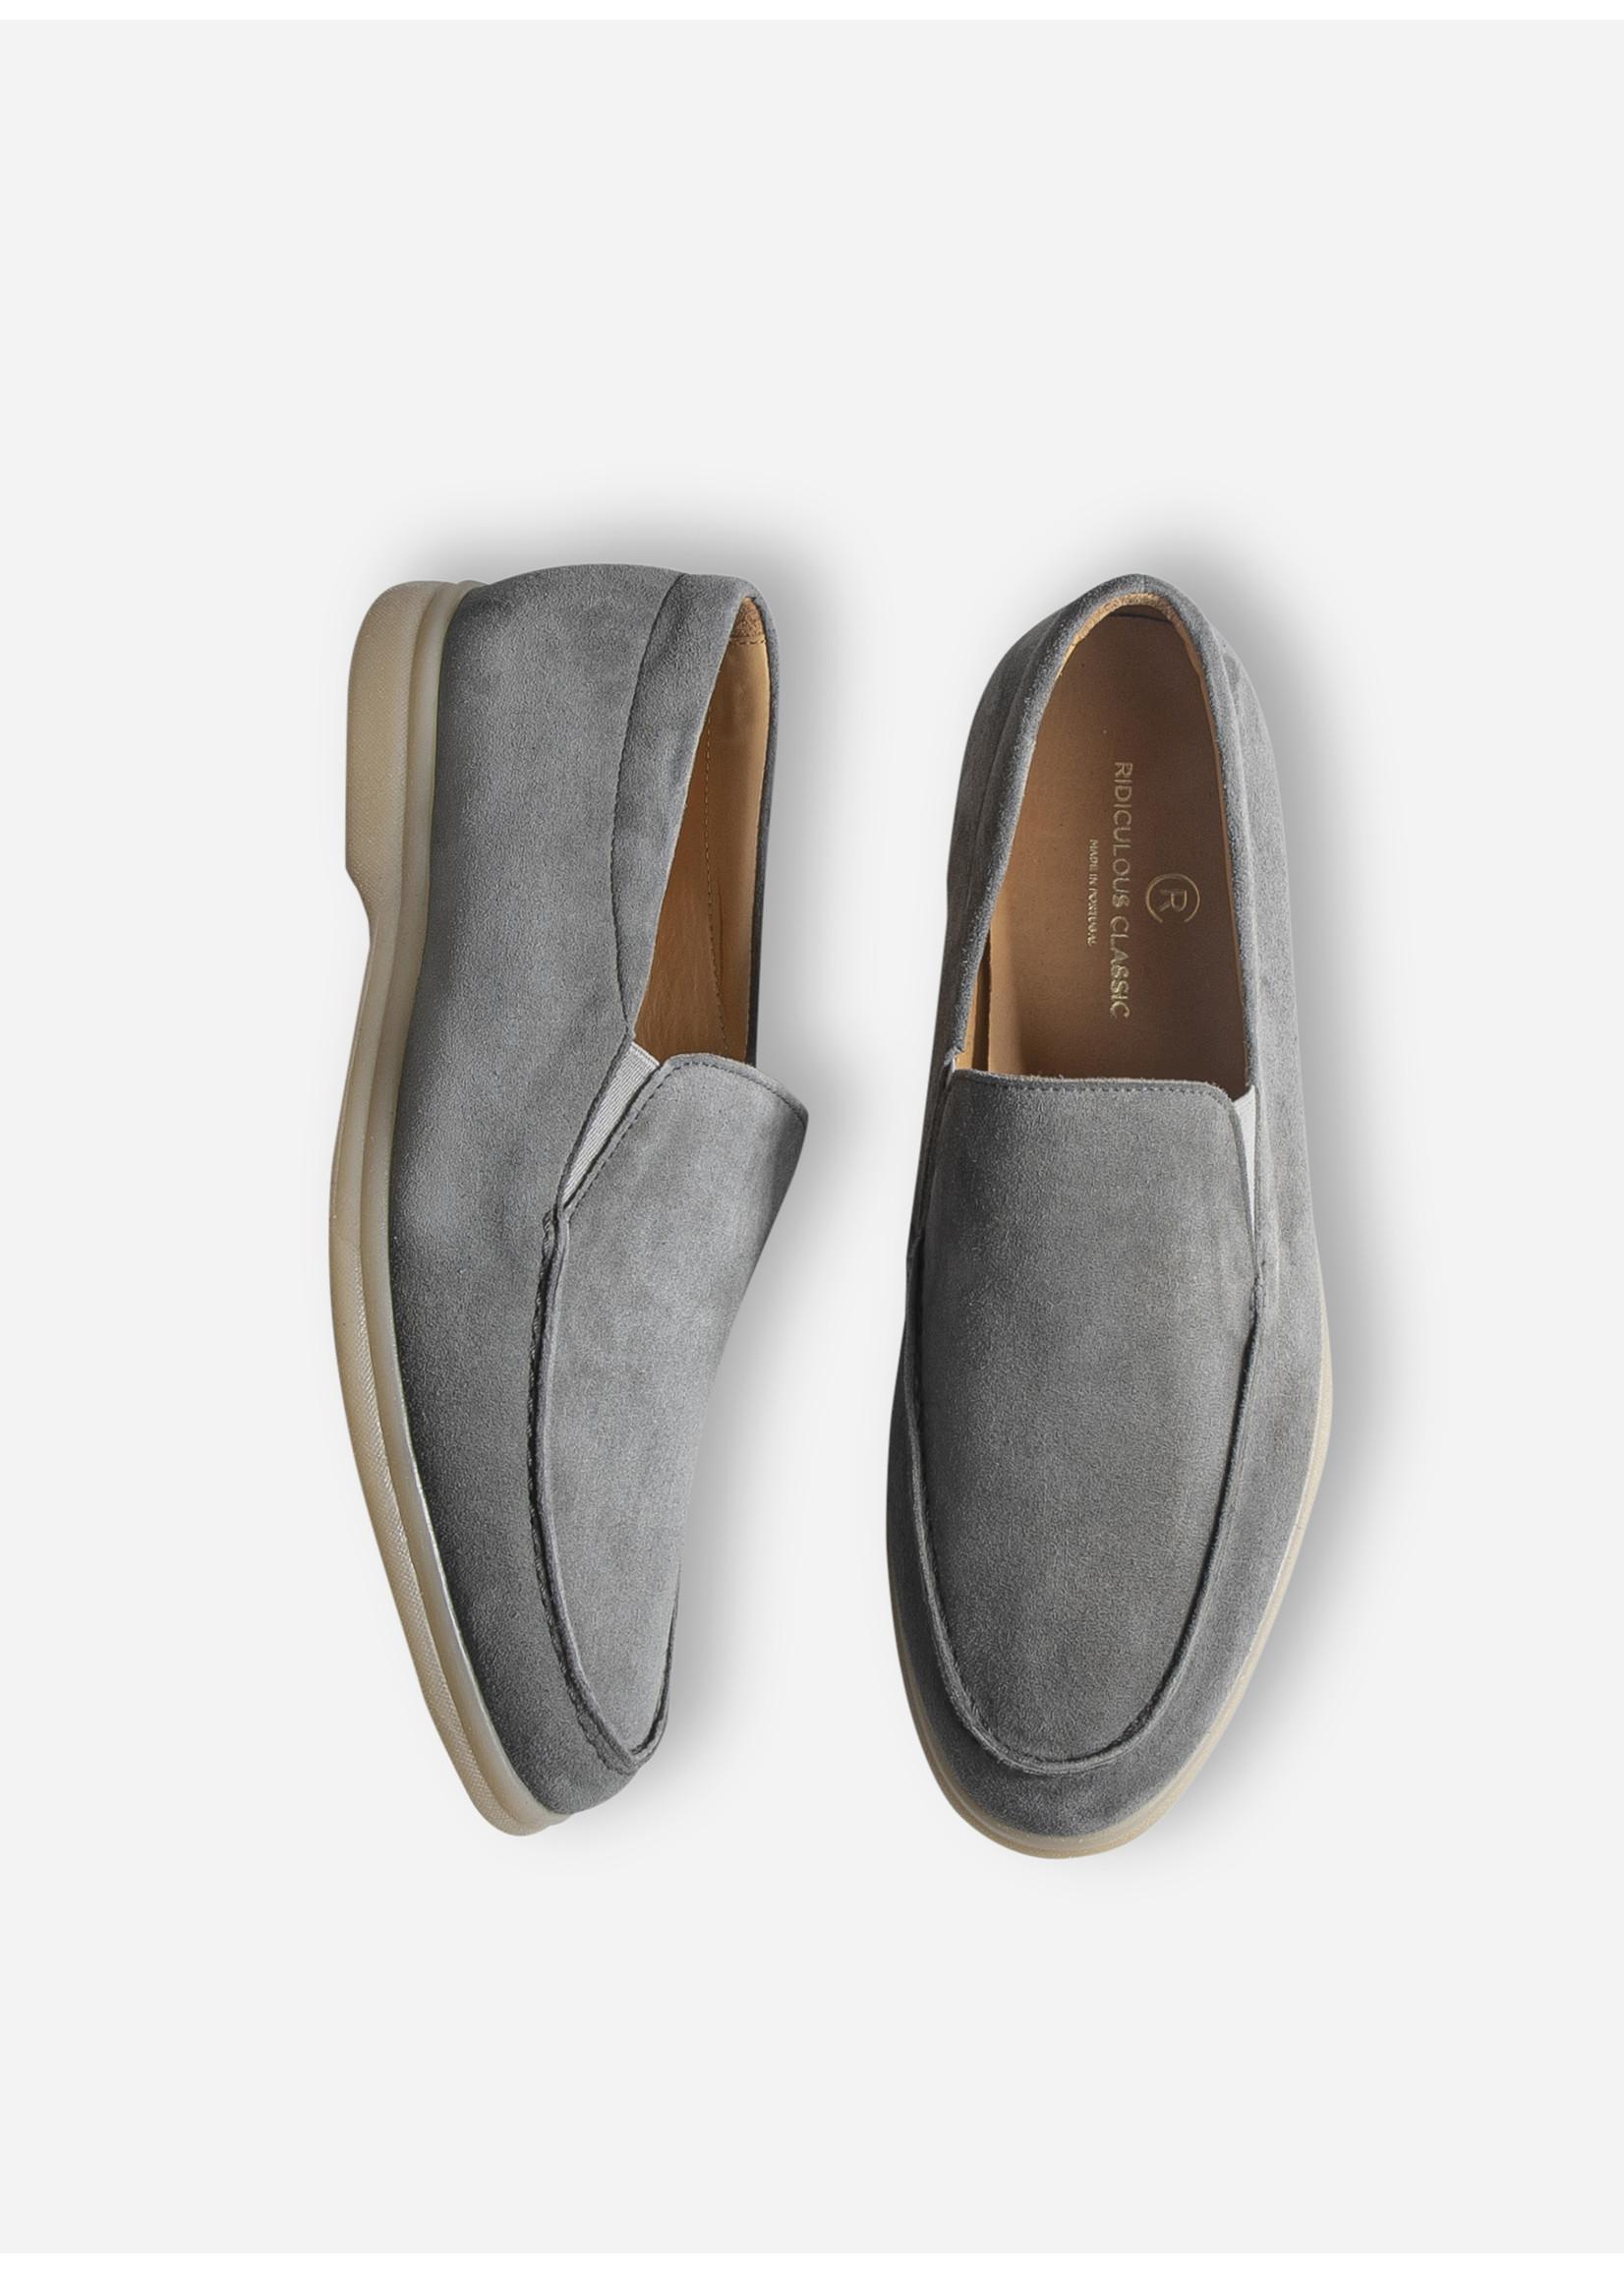 Ridiculous Classic Dock comfort low grey